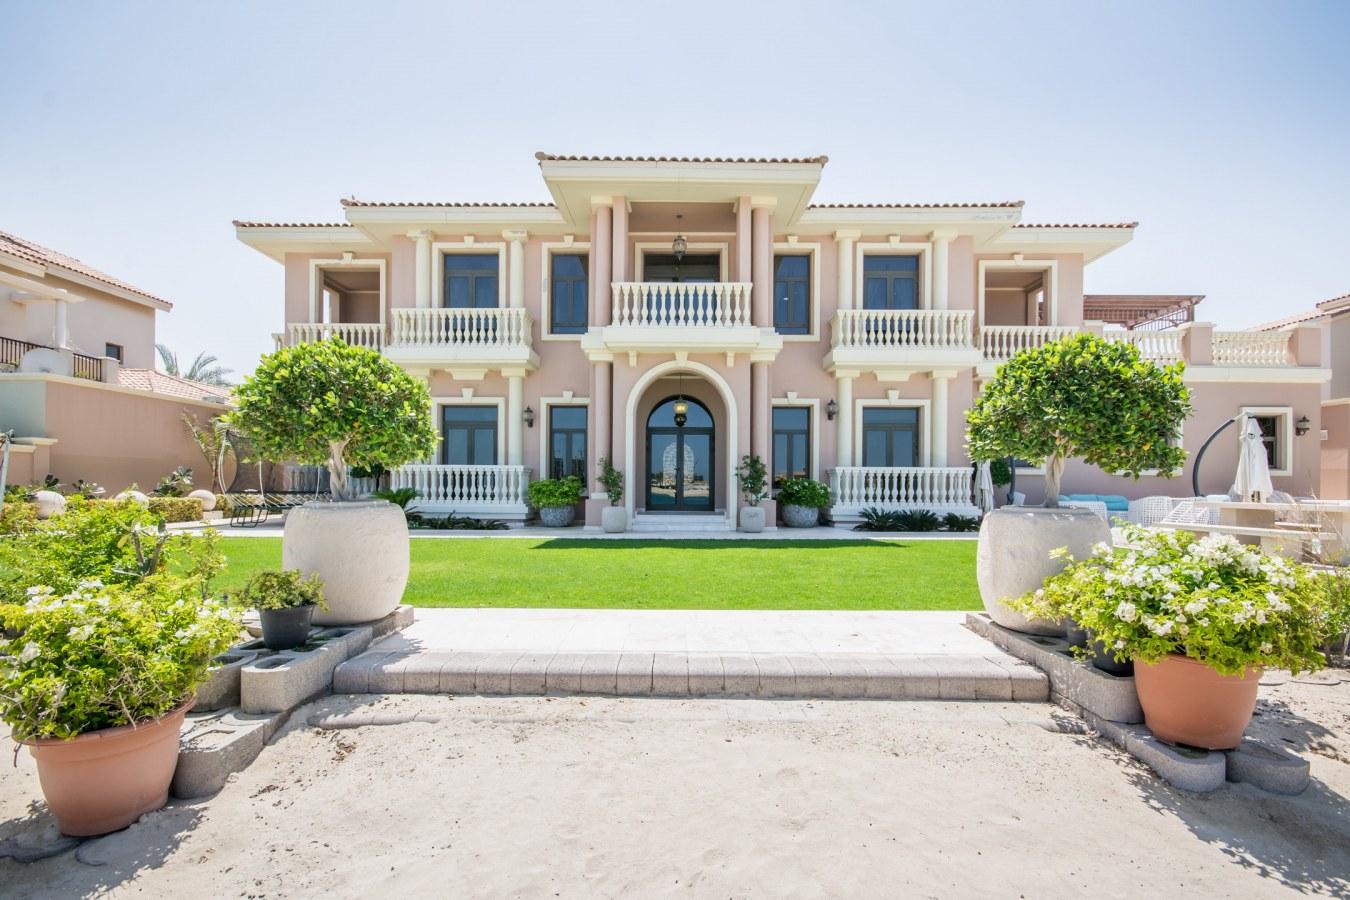 Dubai Luxury Mansions Zion Star